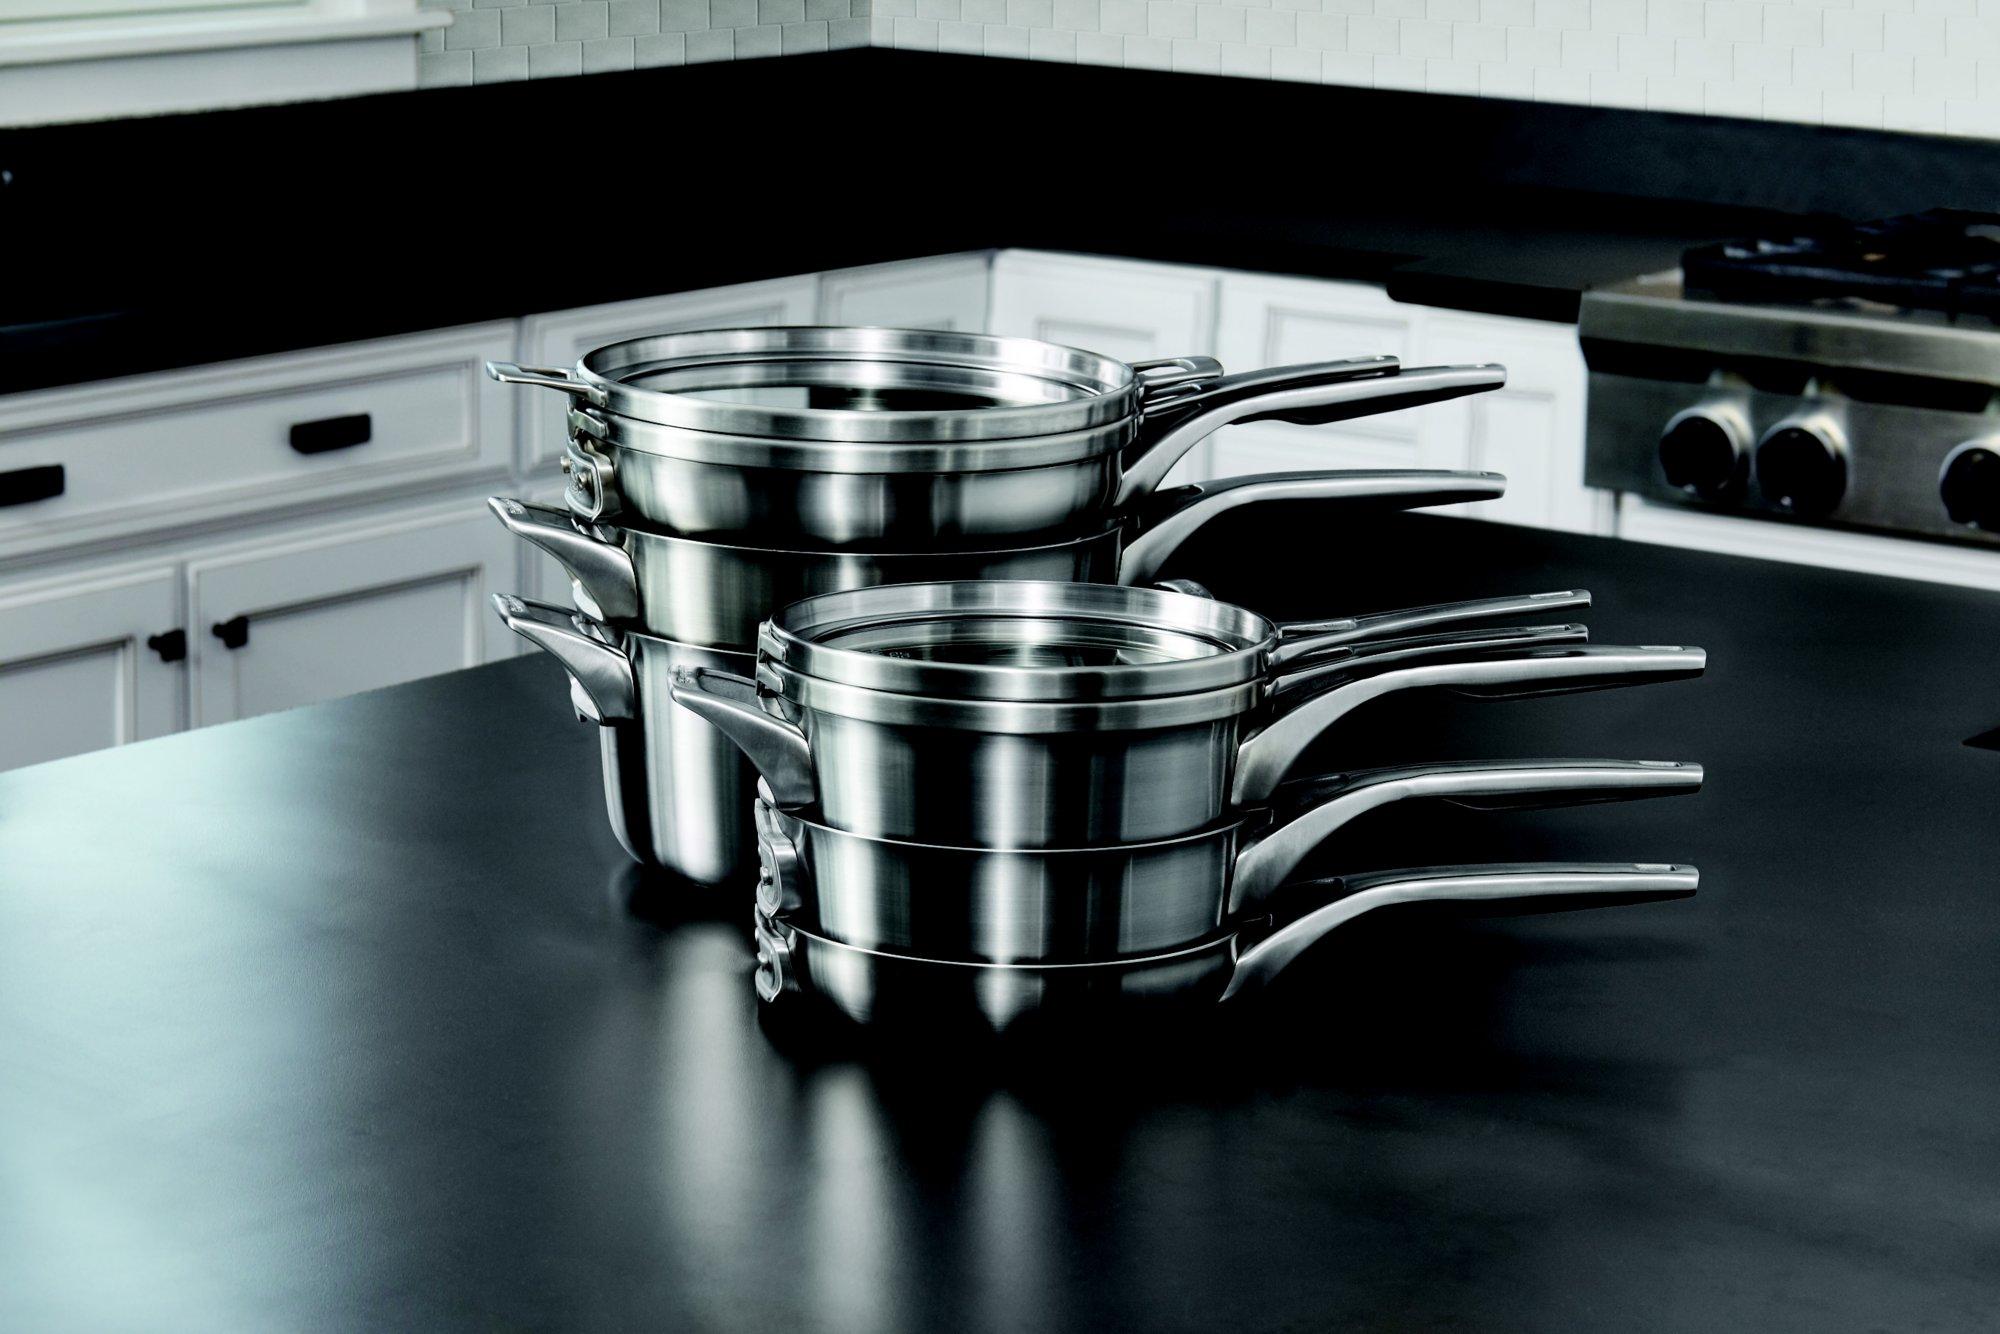 Calphalon Premier Space Saving Stainless Steel 10 Fry Pan